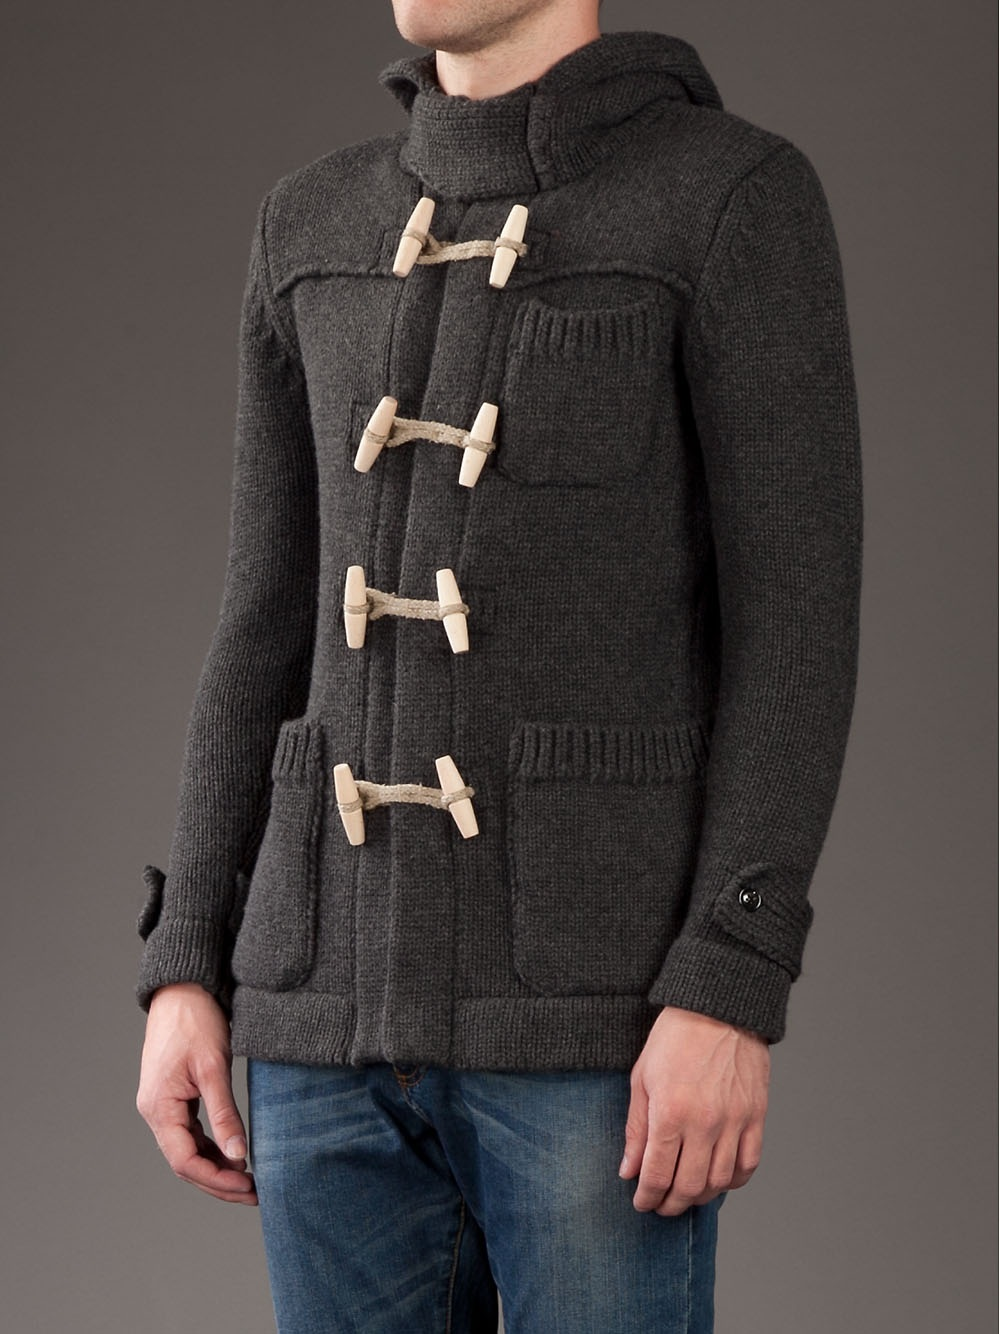 Esemplare Hooded Jacket in Grey (Grey) for Men